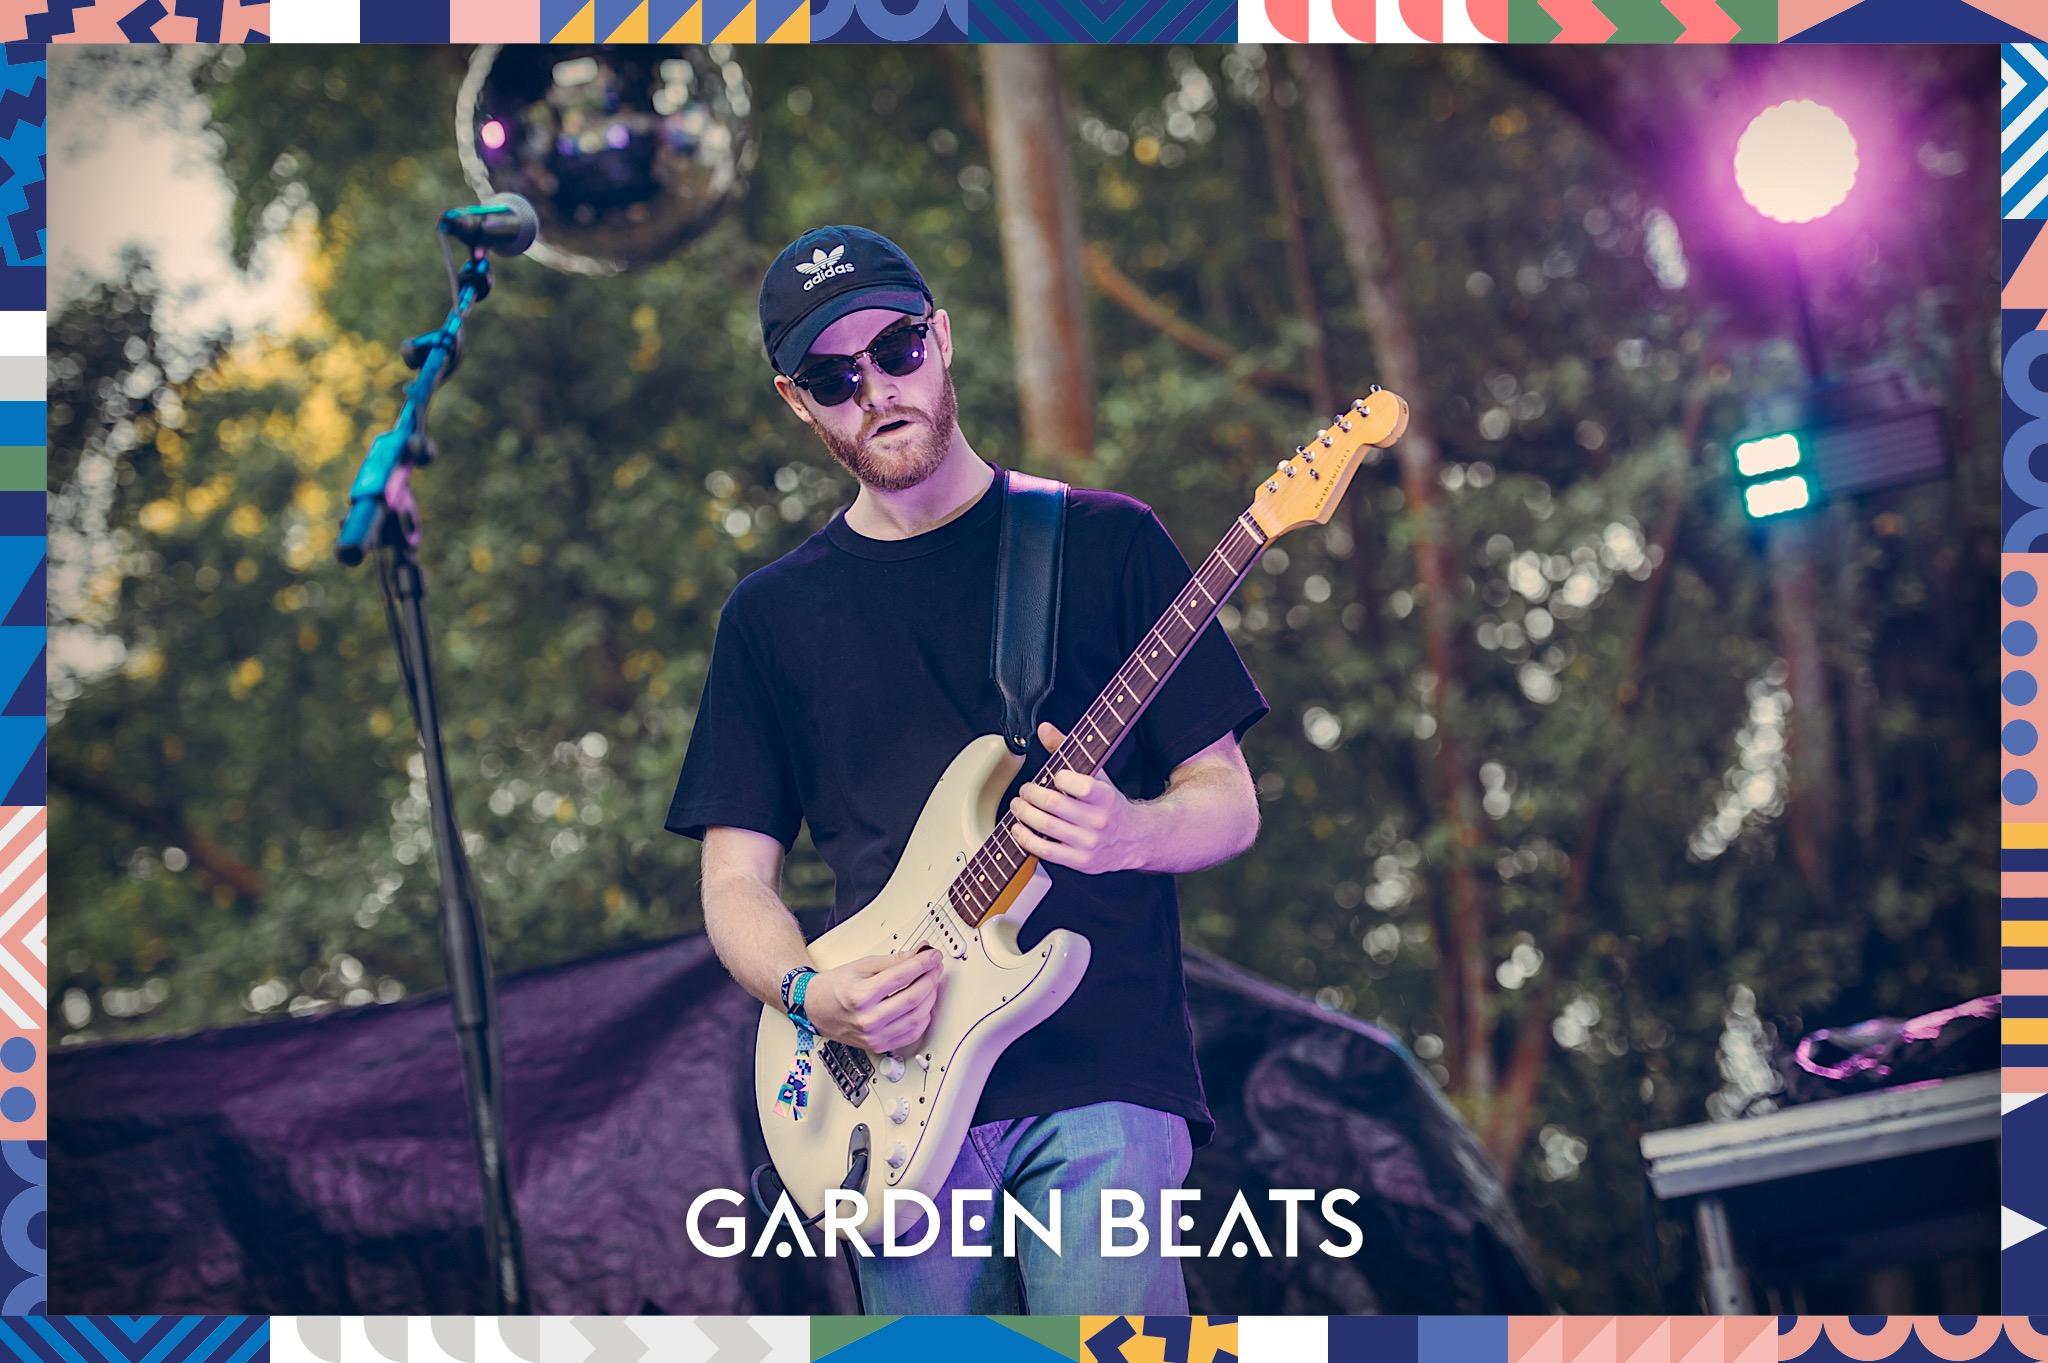 03032018_GardenBeats_Colossal541_Watermarked.jpg